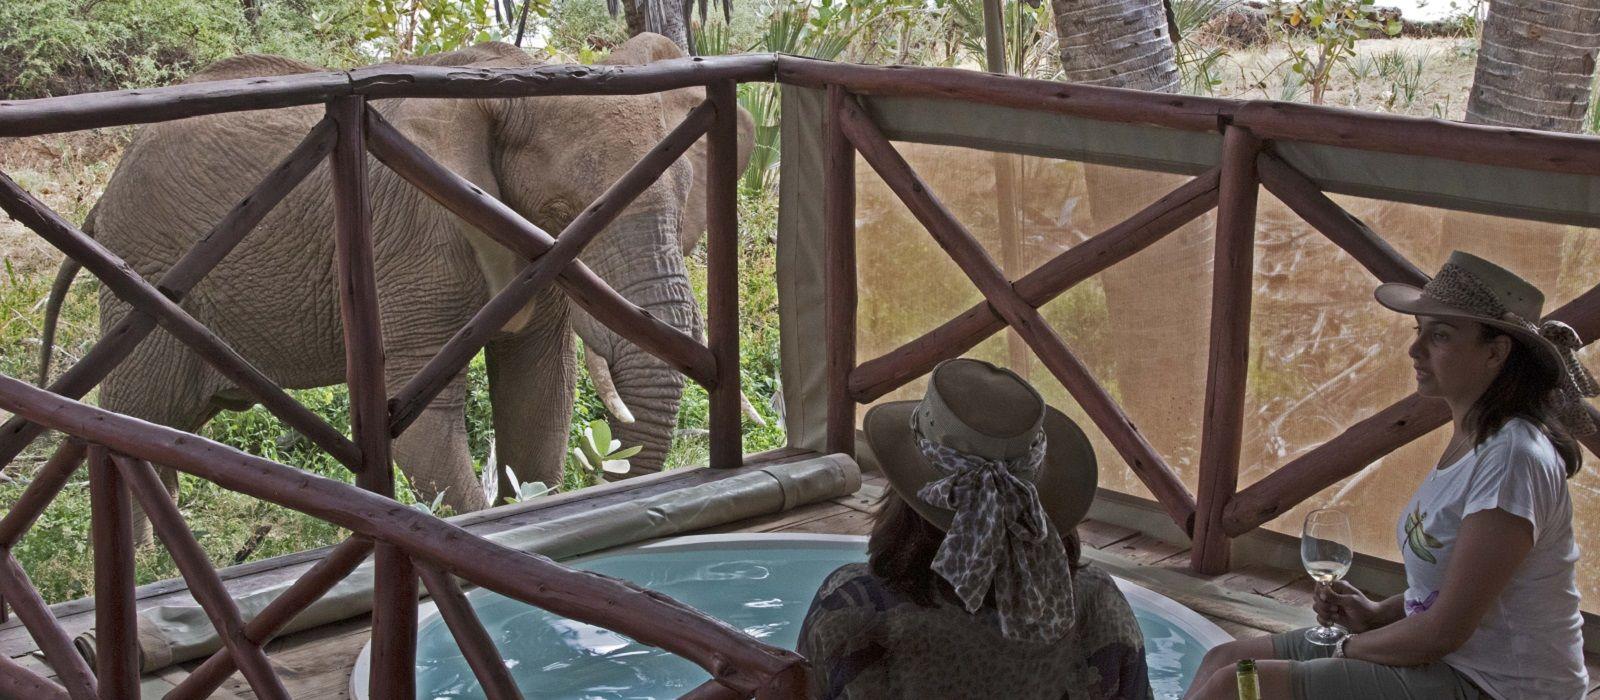 Atua Enkop Exclusive: Kenya Safari and Beach Break Tour Trip 7